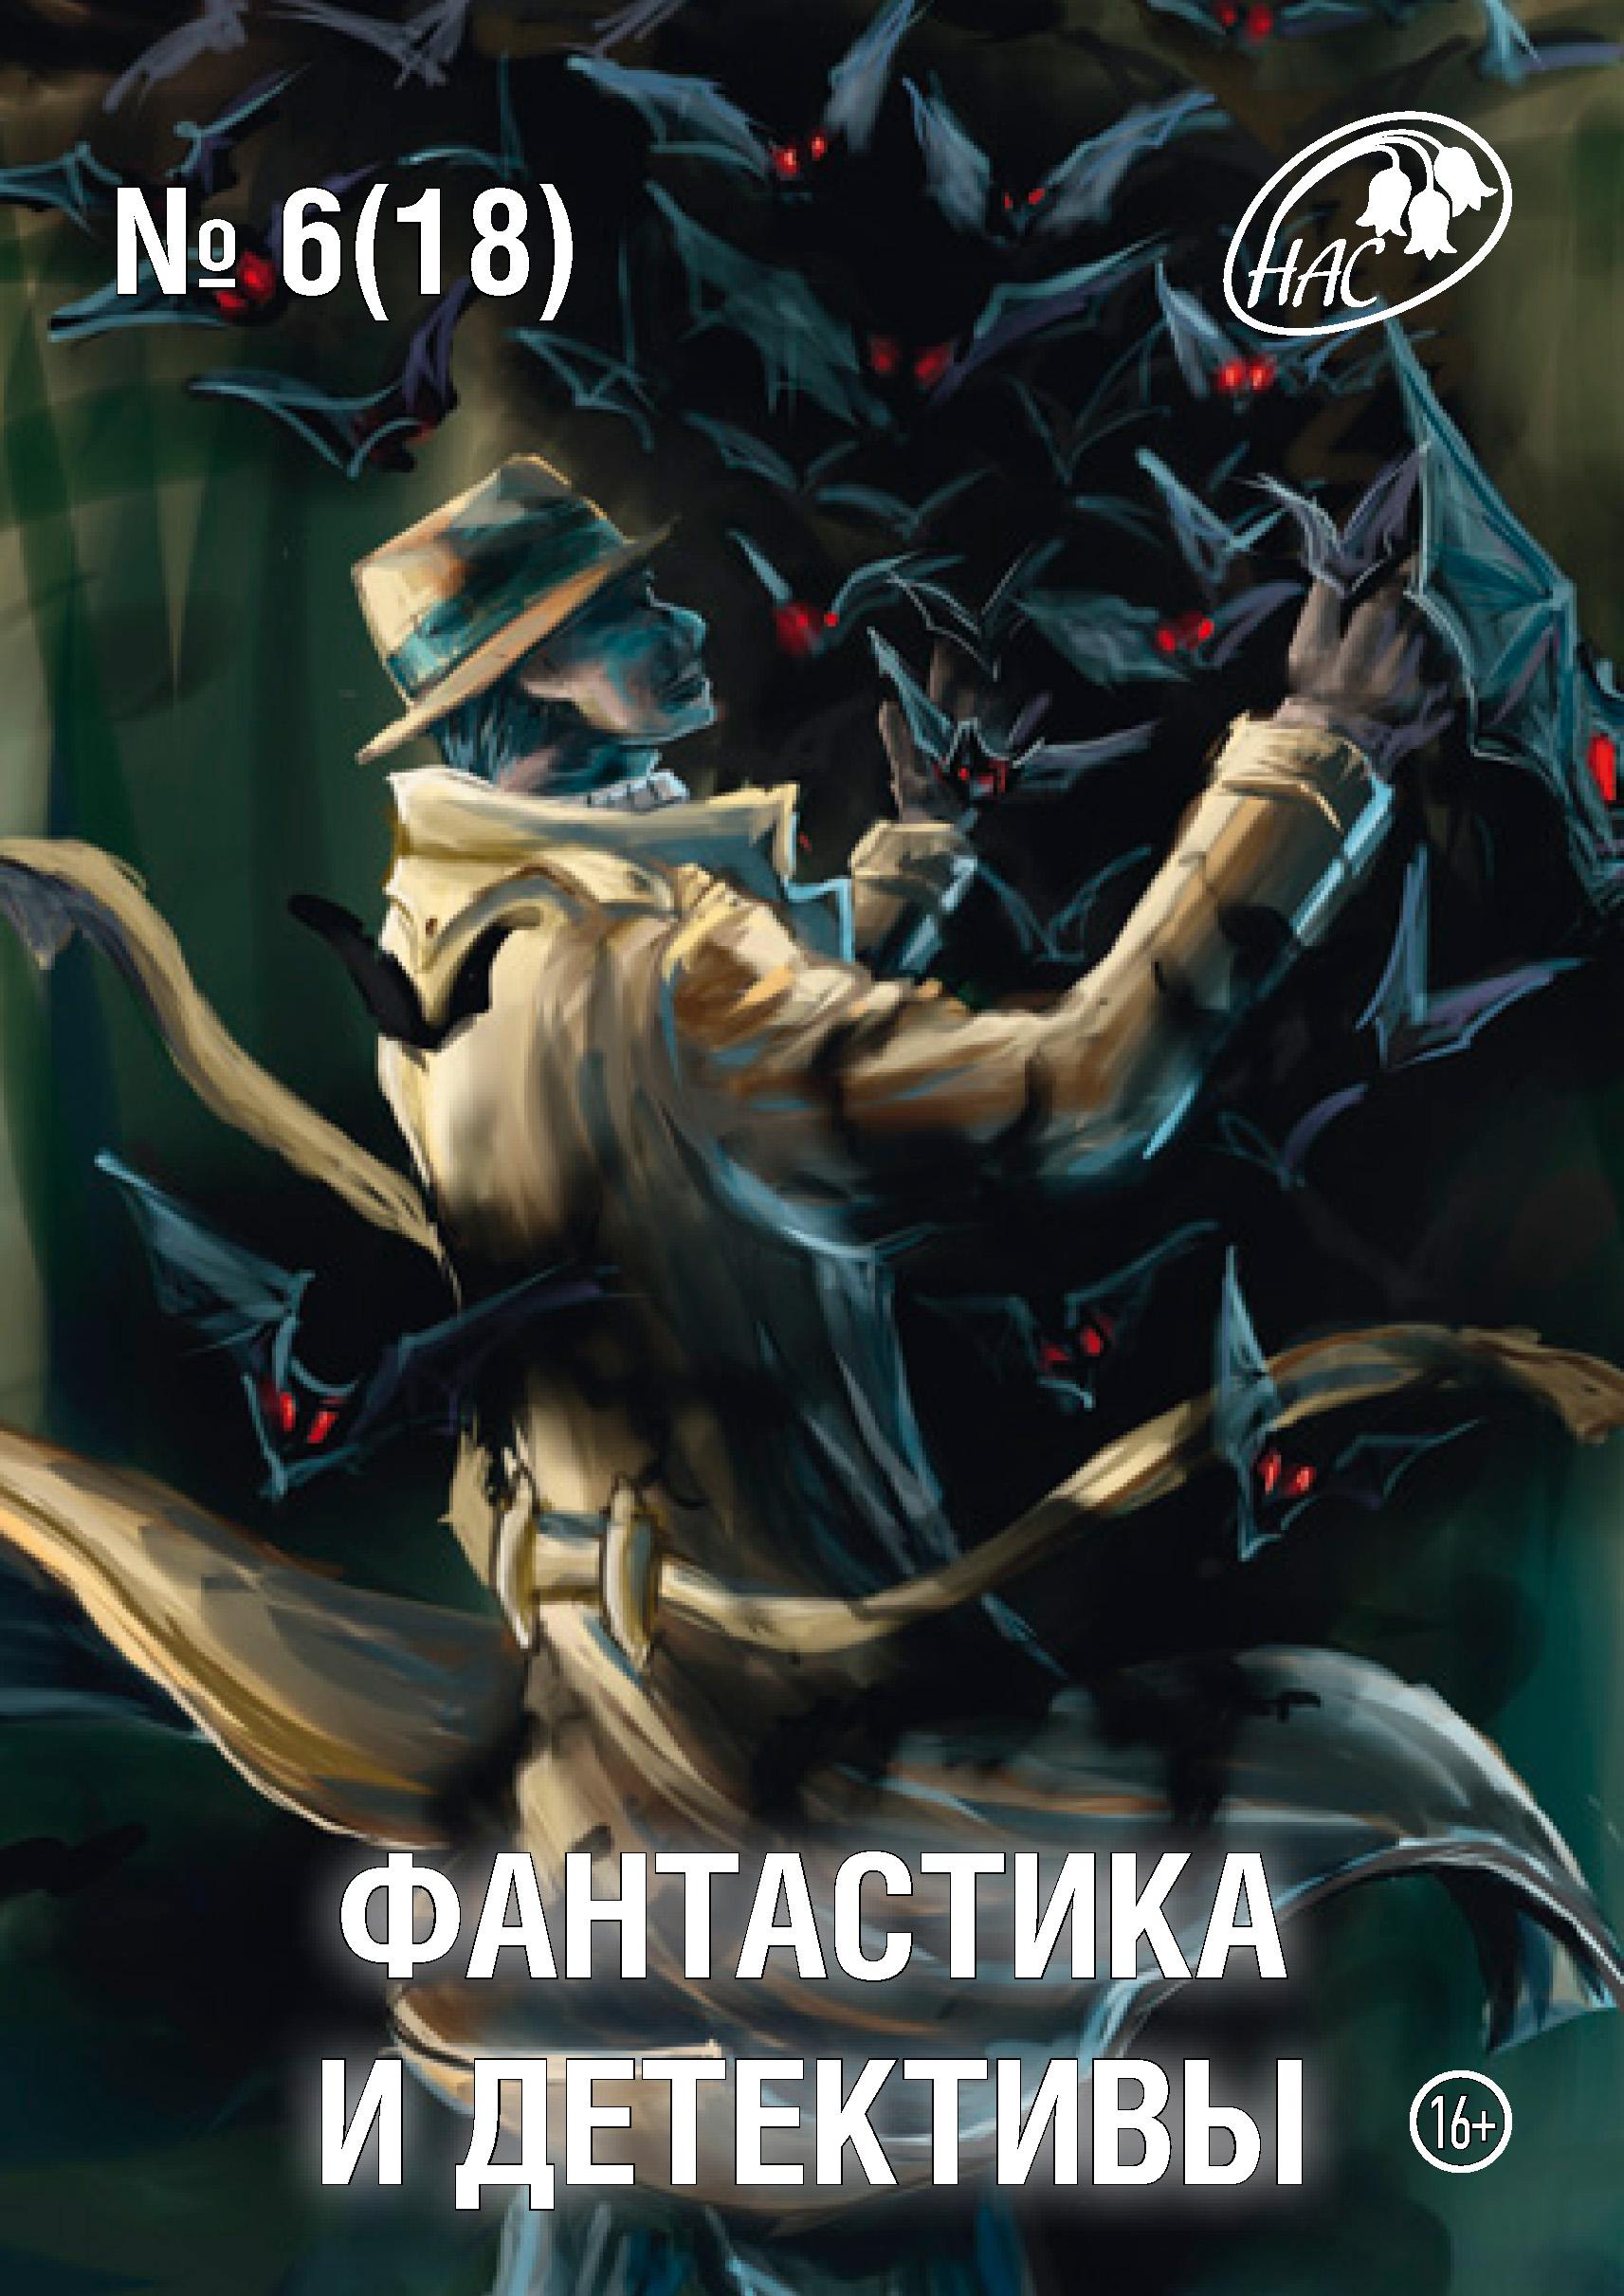 Сборник Журнал «Фантастика и Детективы» №6 (18) 2014 сборник журнал фантастика и детективы 5